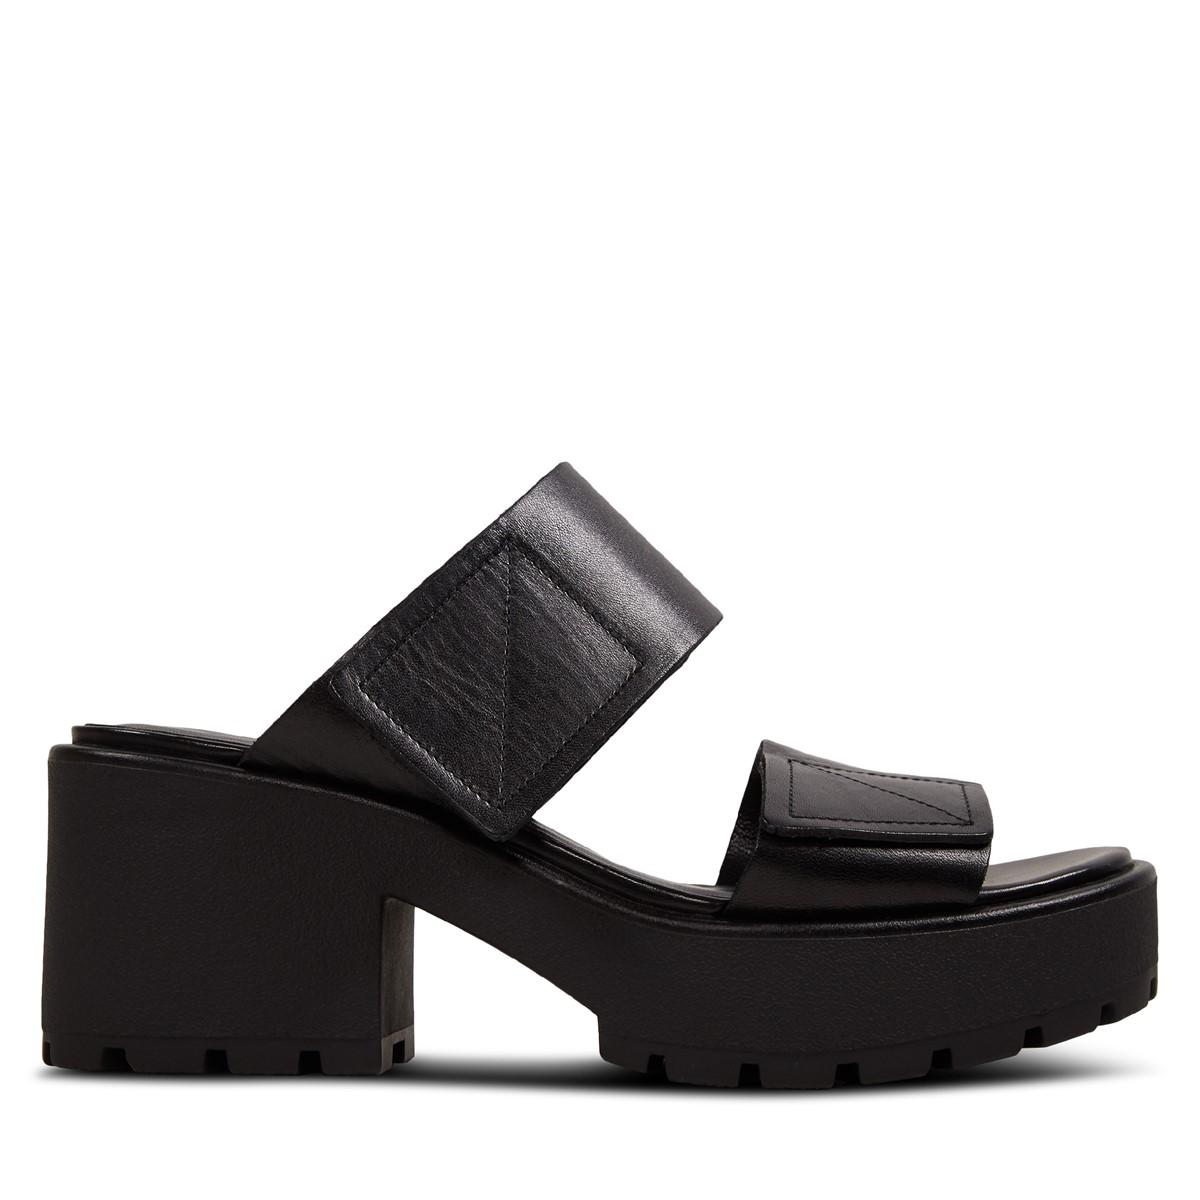 Women's Dioon Heeled Slip-On Sandals in Black